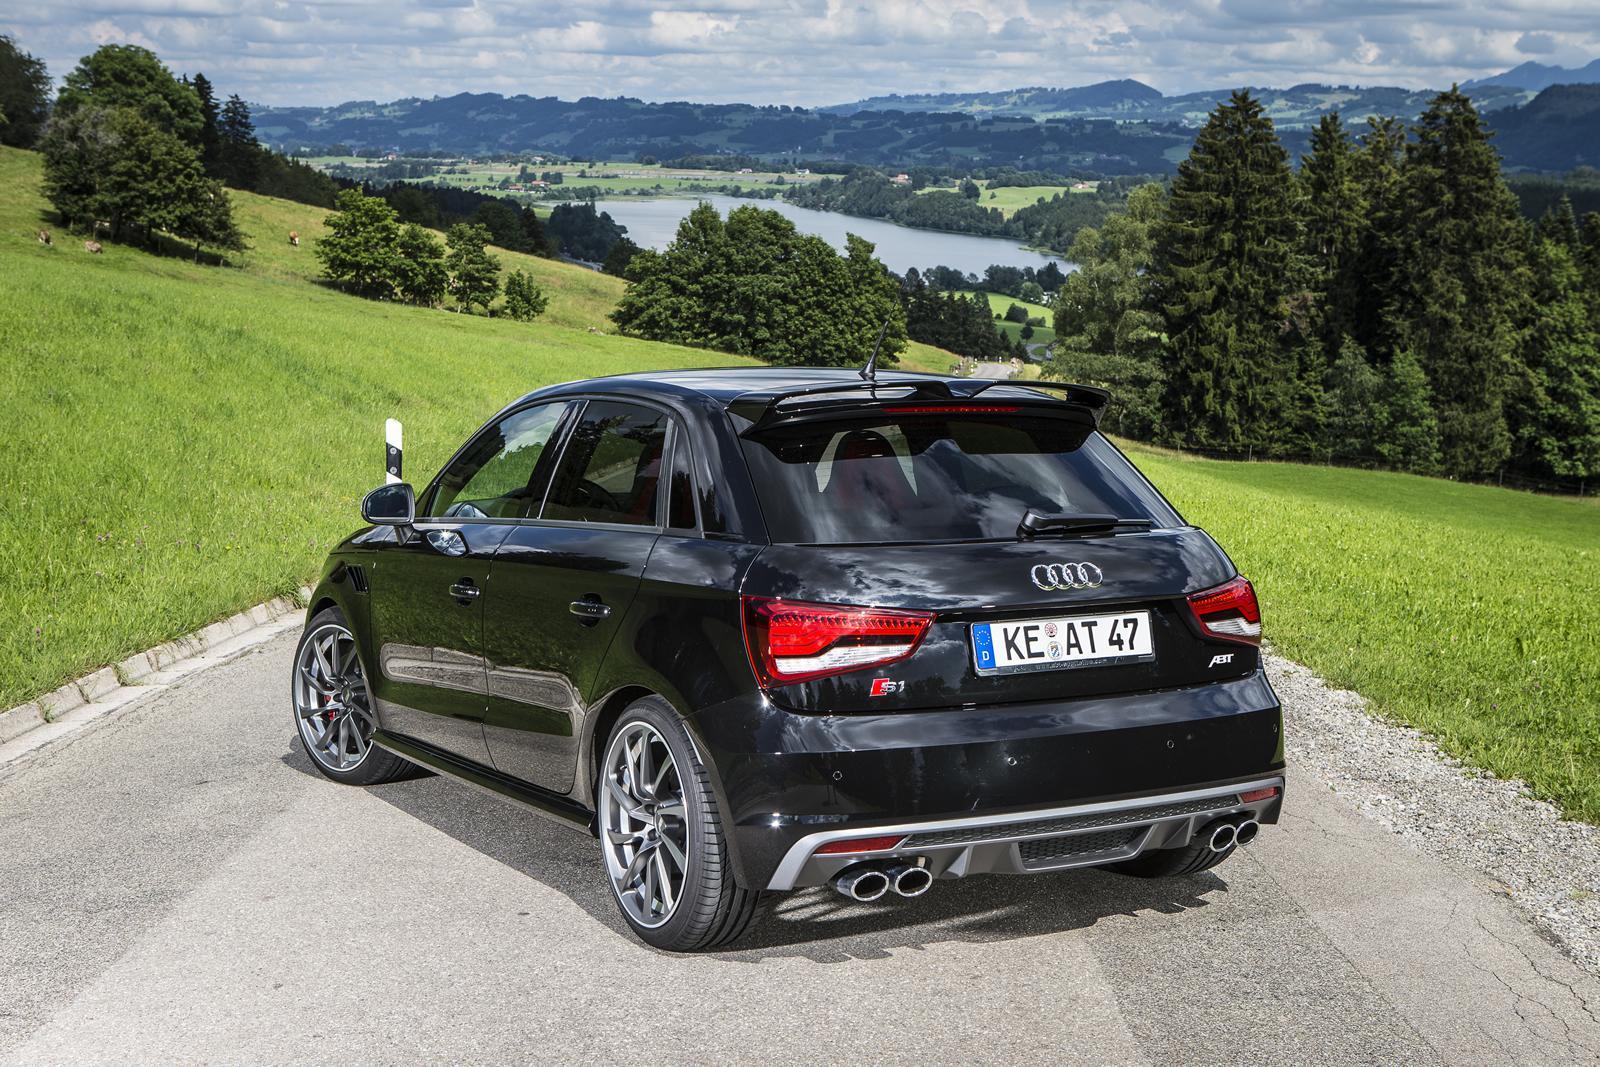 Audi S1 Sportback Wallpapers Vehicles Hq Audi S1 Sportback Pictures 4k Wallpapers 2019